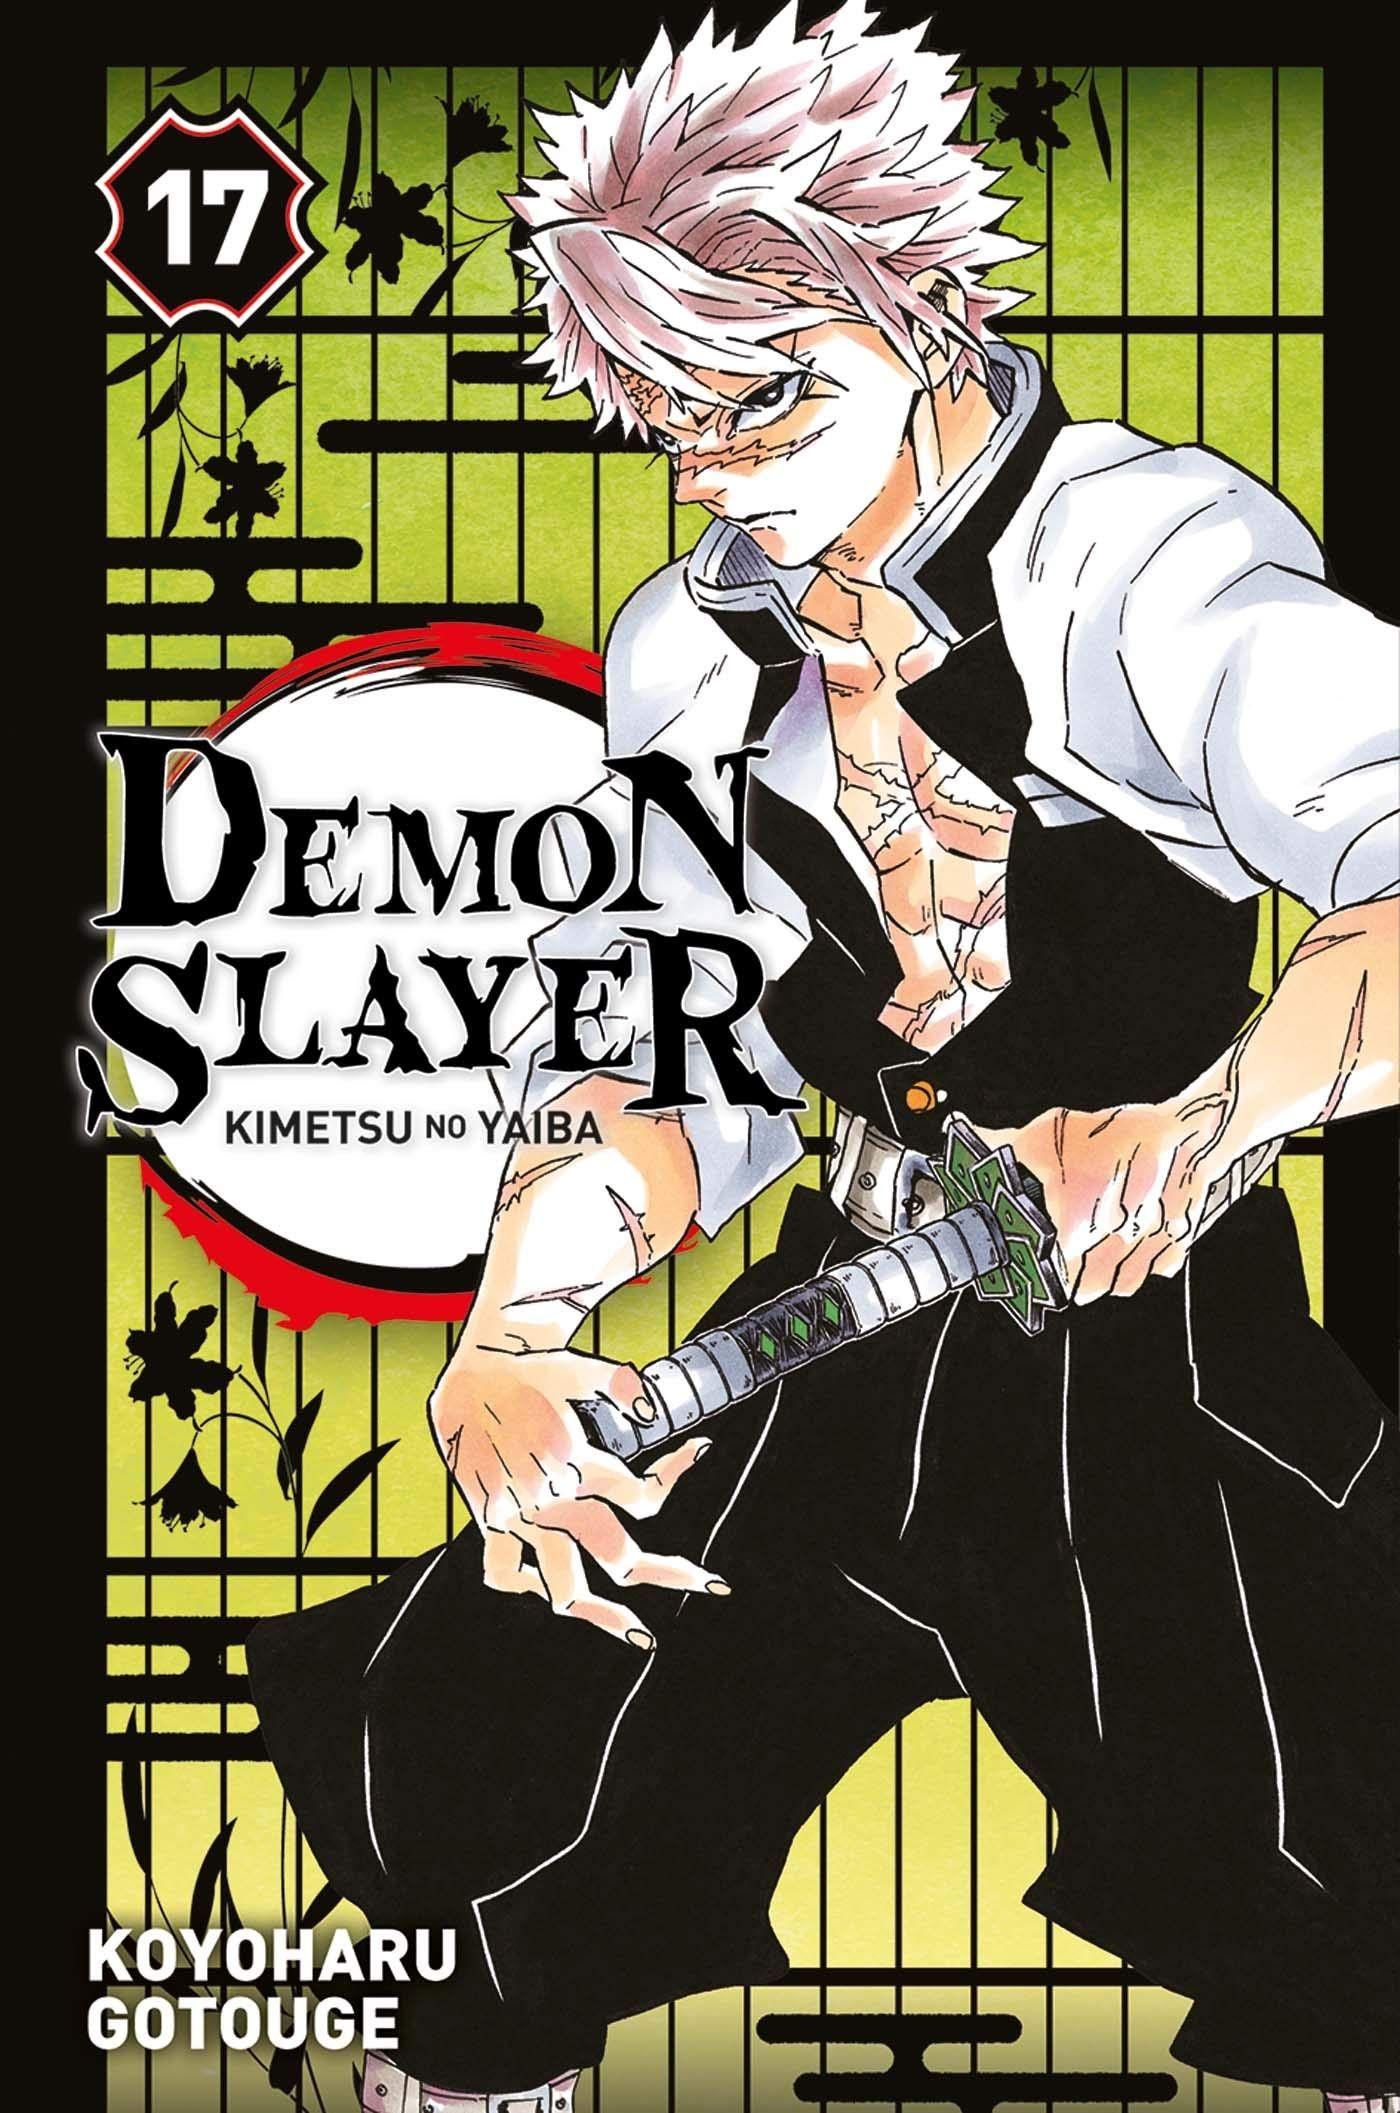 Sortie Manga au Québec JUILLET 2021 Demon-slayer-17-panini